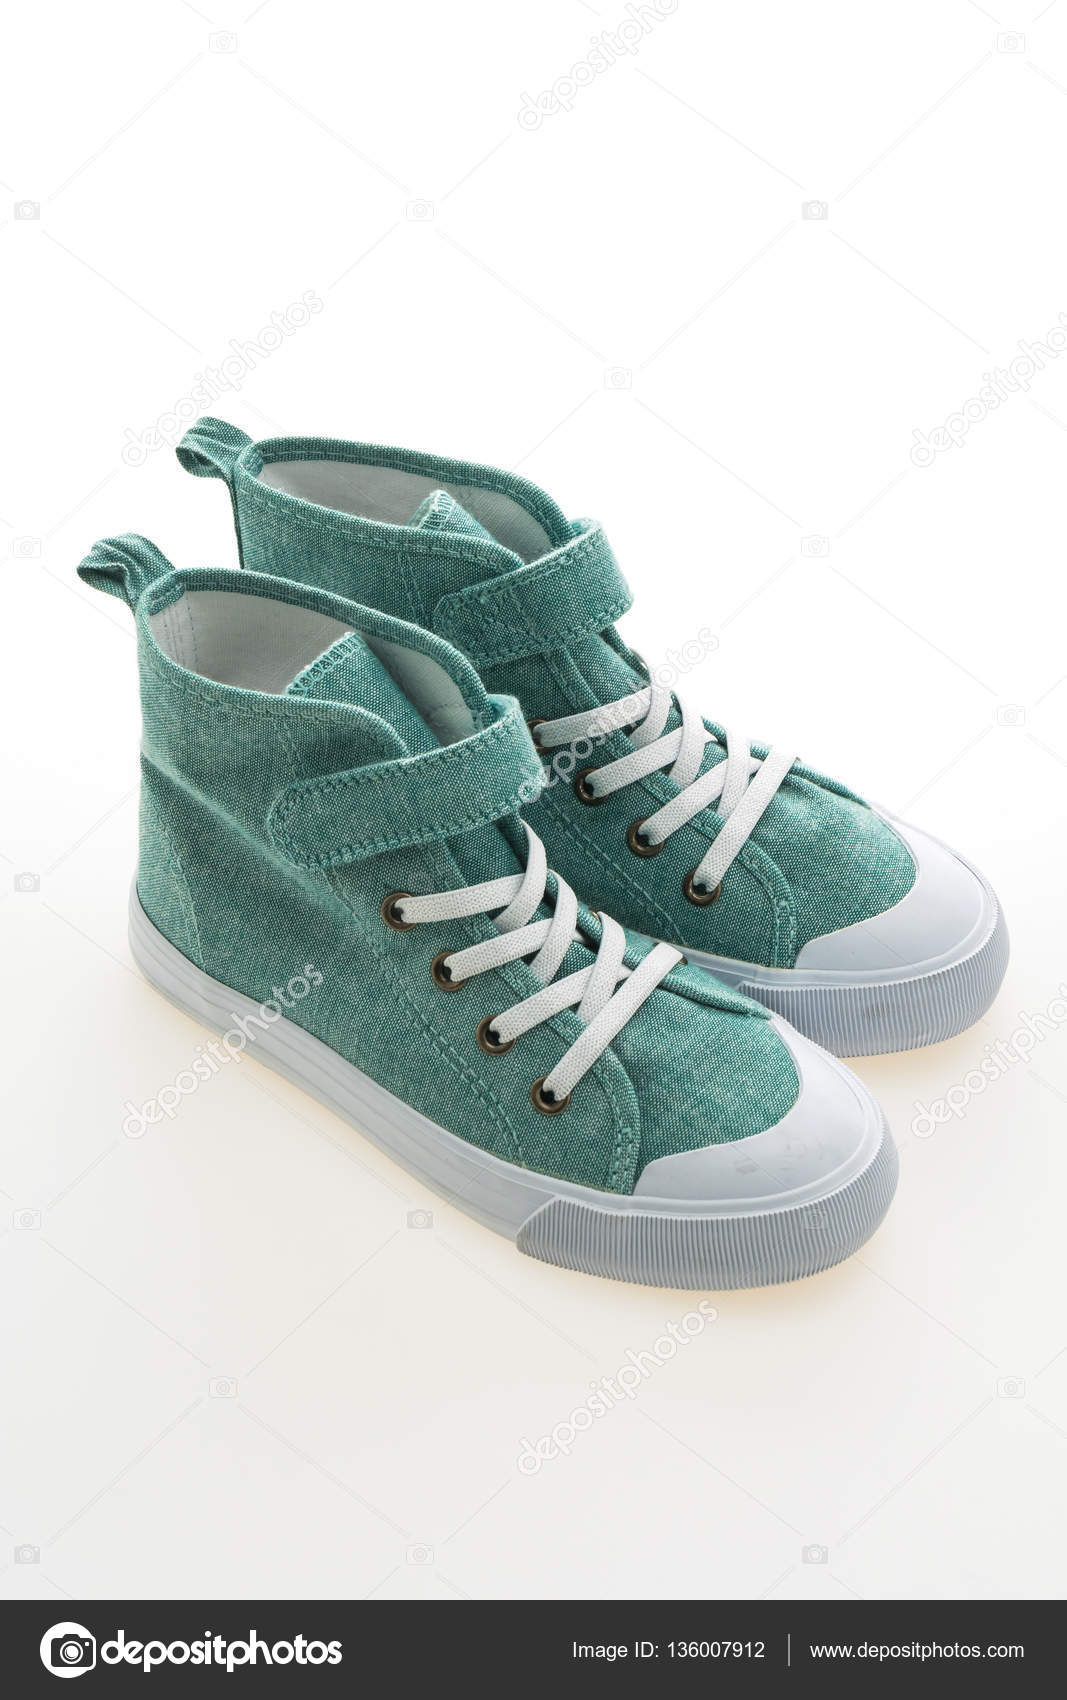 a23cb7072d6 νέα μόδα παπούτσια — Φωτογραφία Αρχείου © mrsiraphol #136007912